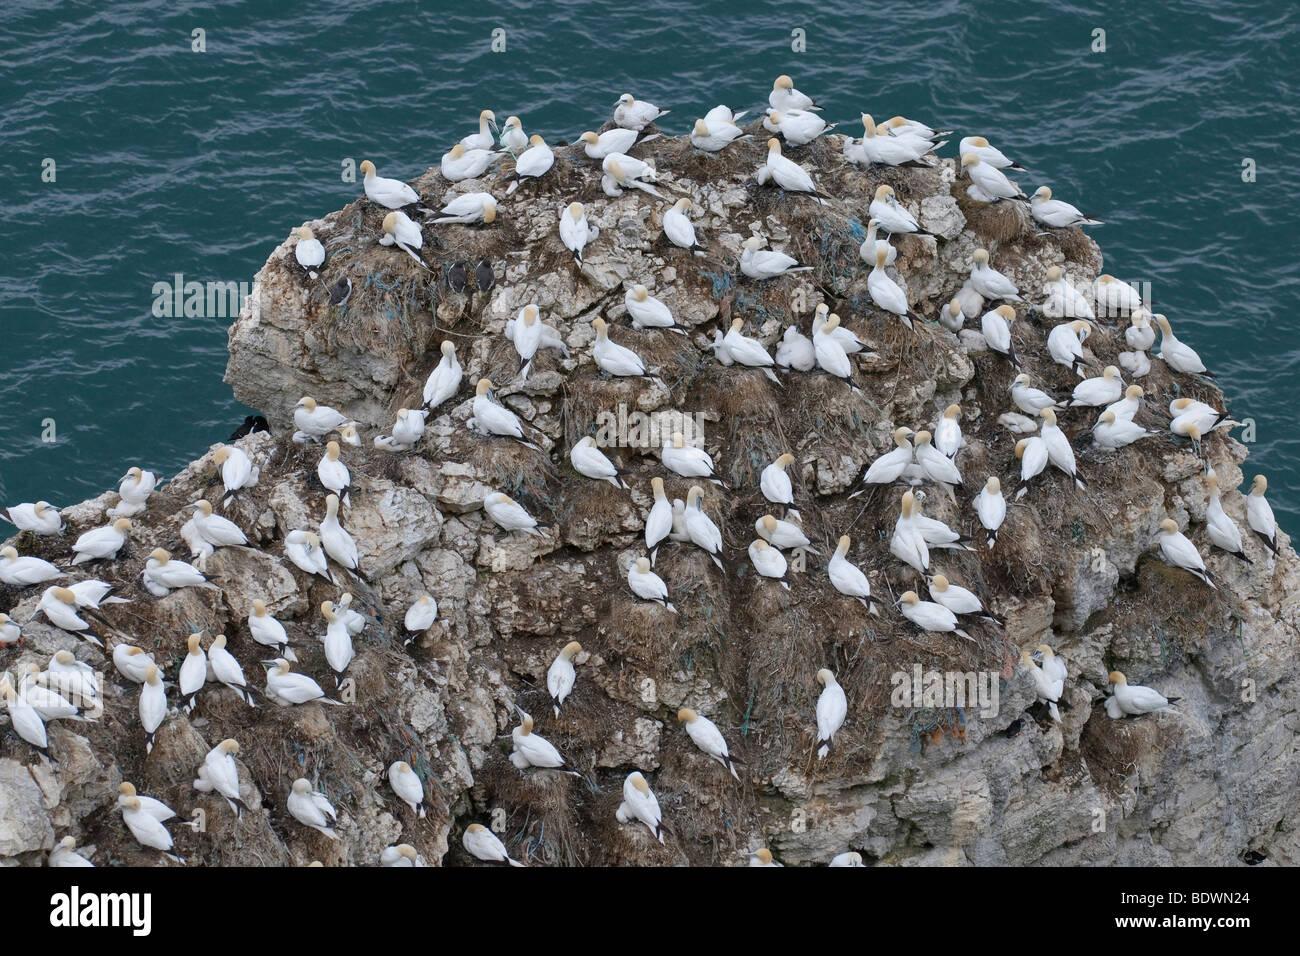 Northern gannet Morus bassanus breeding colony at Bempton Cliffs RSPB reserve, East Yorkshire, England. - Stock Image